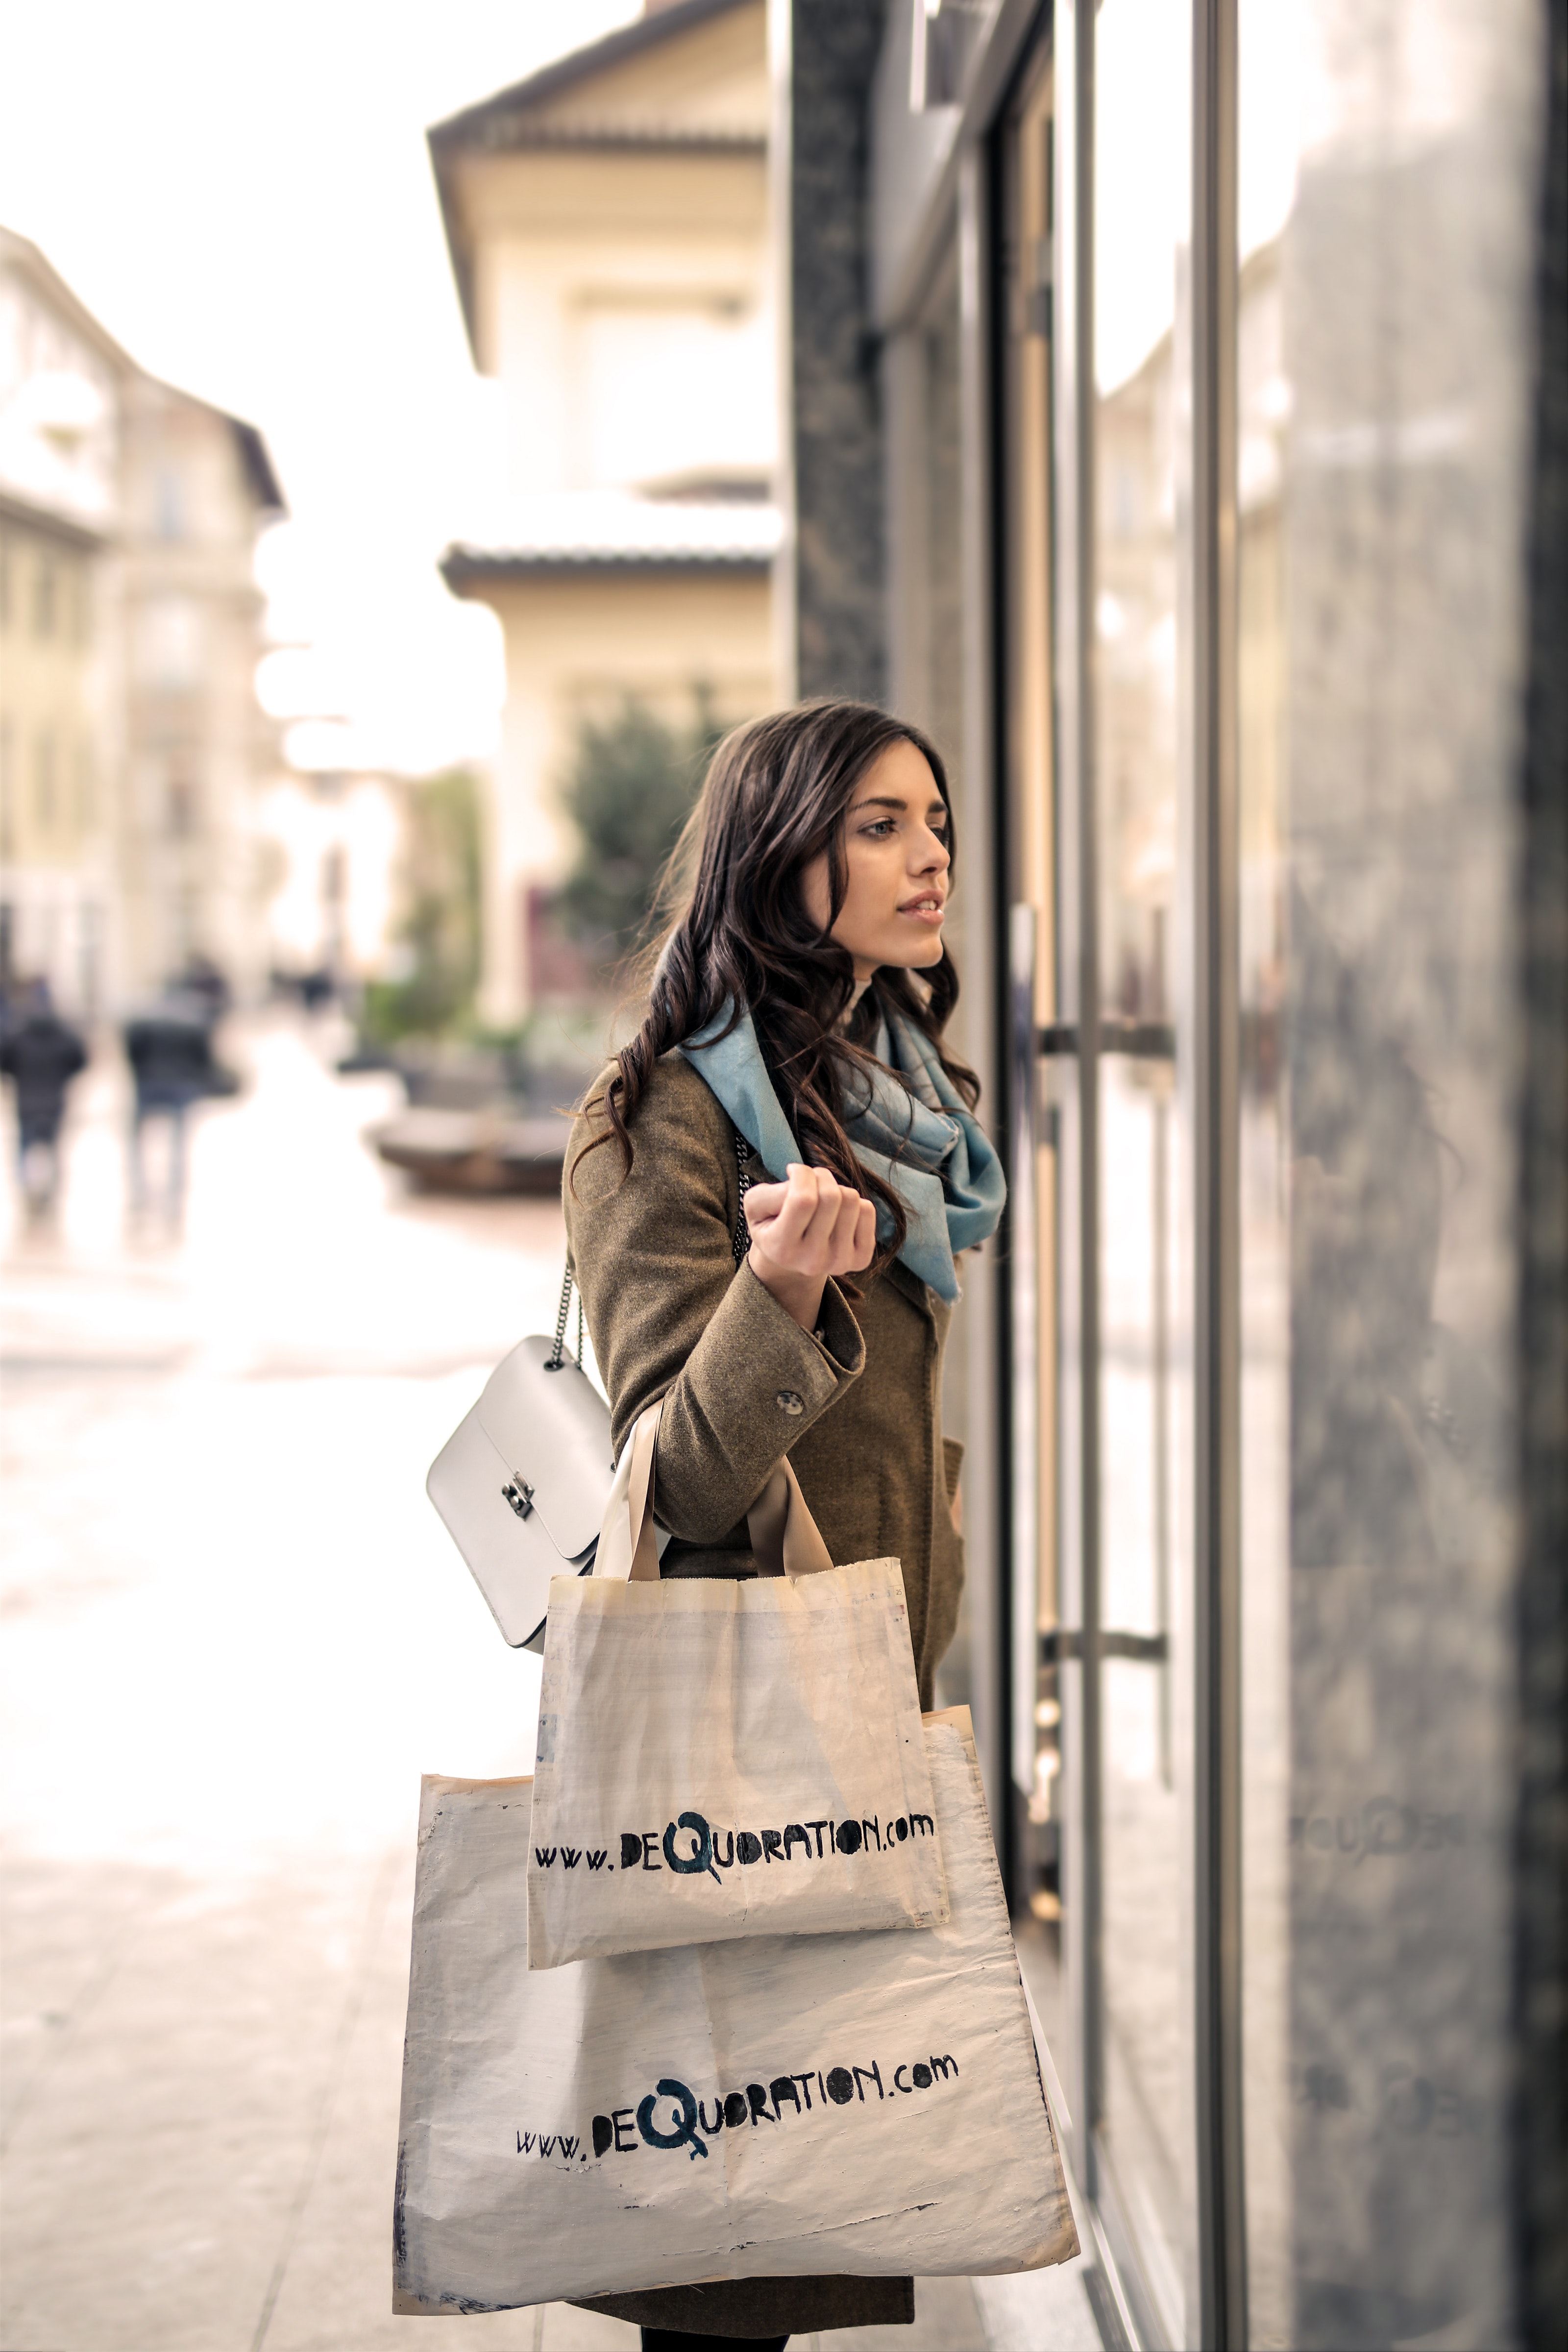 Woman Wearing Gray Coat, Bag, Retail, Woman, Window, HQ Photo